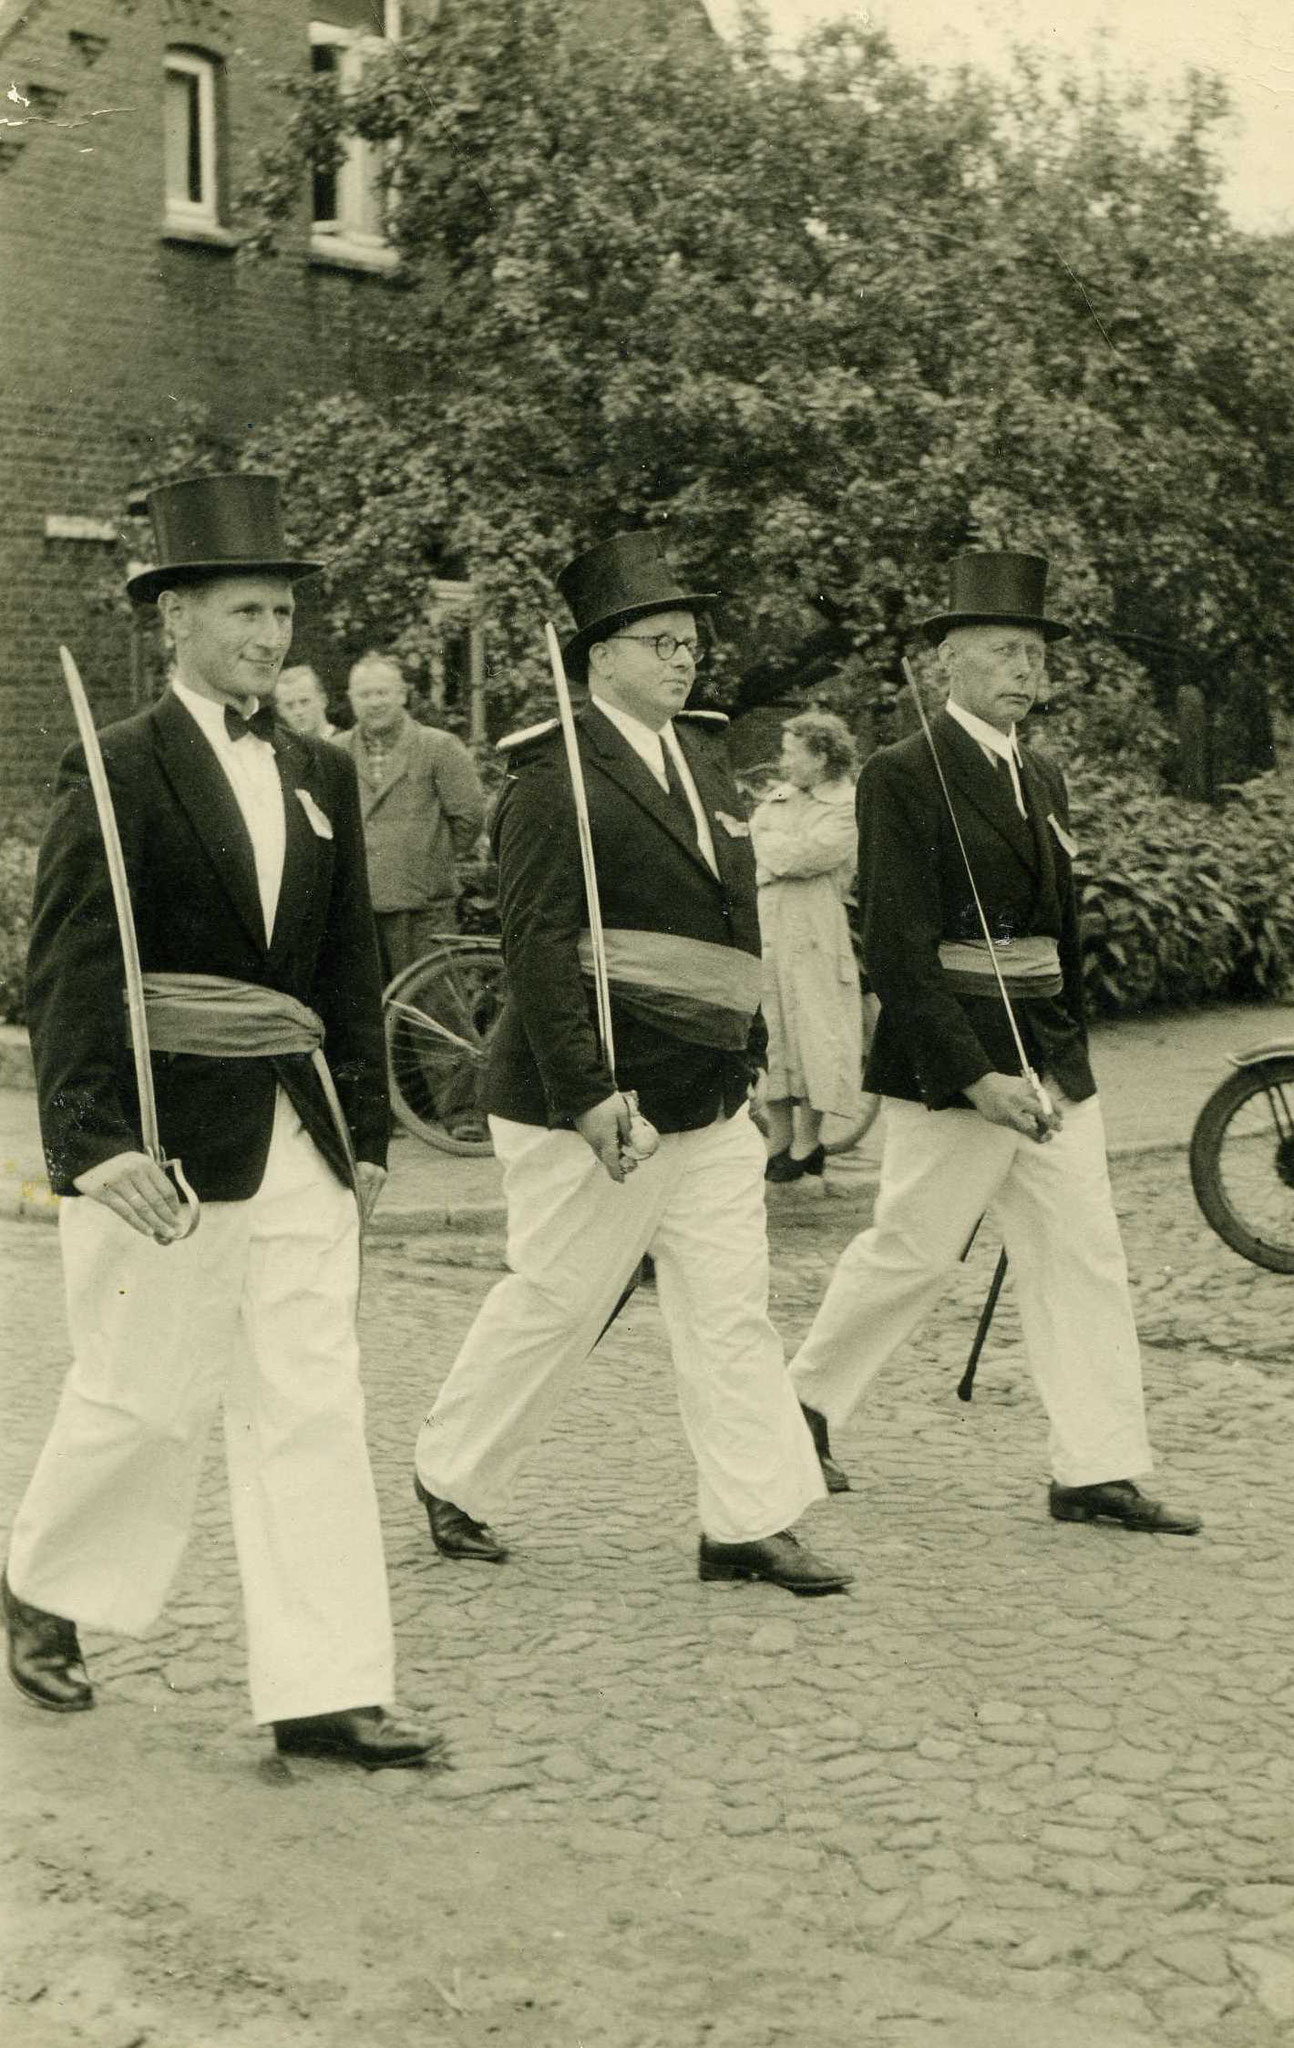 Josef Varwig, Norbert Bergmann und Josef Dultmeyer